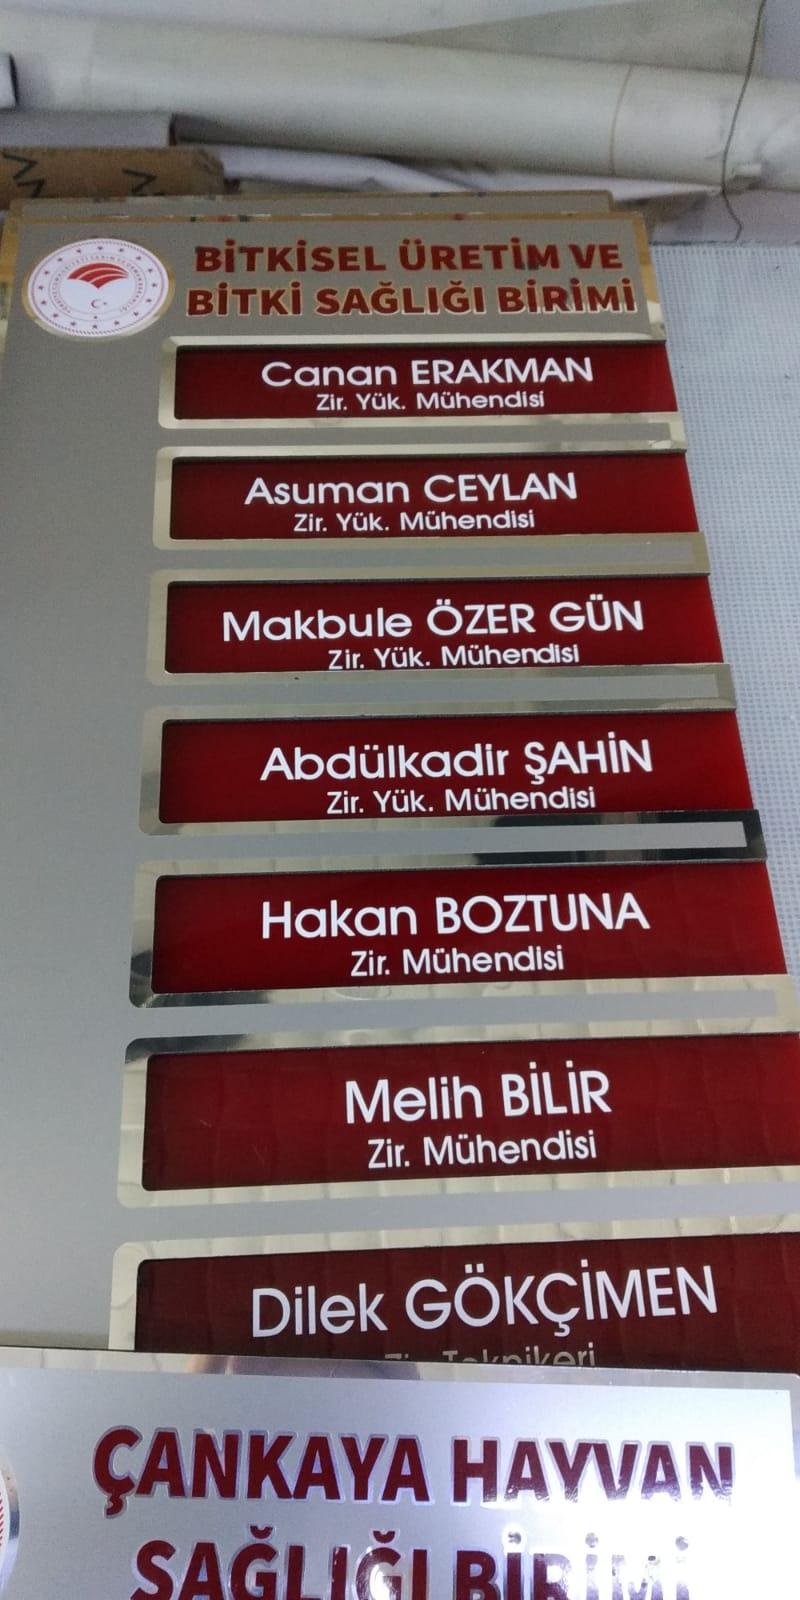 Ankara Tabela, Tabela Ankara, İstanbul Tabela, Tabela İstanbul, Ankara Tabela Firmaları, Ankara Tabela Reklam, Ankara Yönlendirme, Tabela, Ankara Araç Giydirme, Ankara Araç Kaplama, Anka (30)